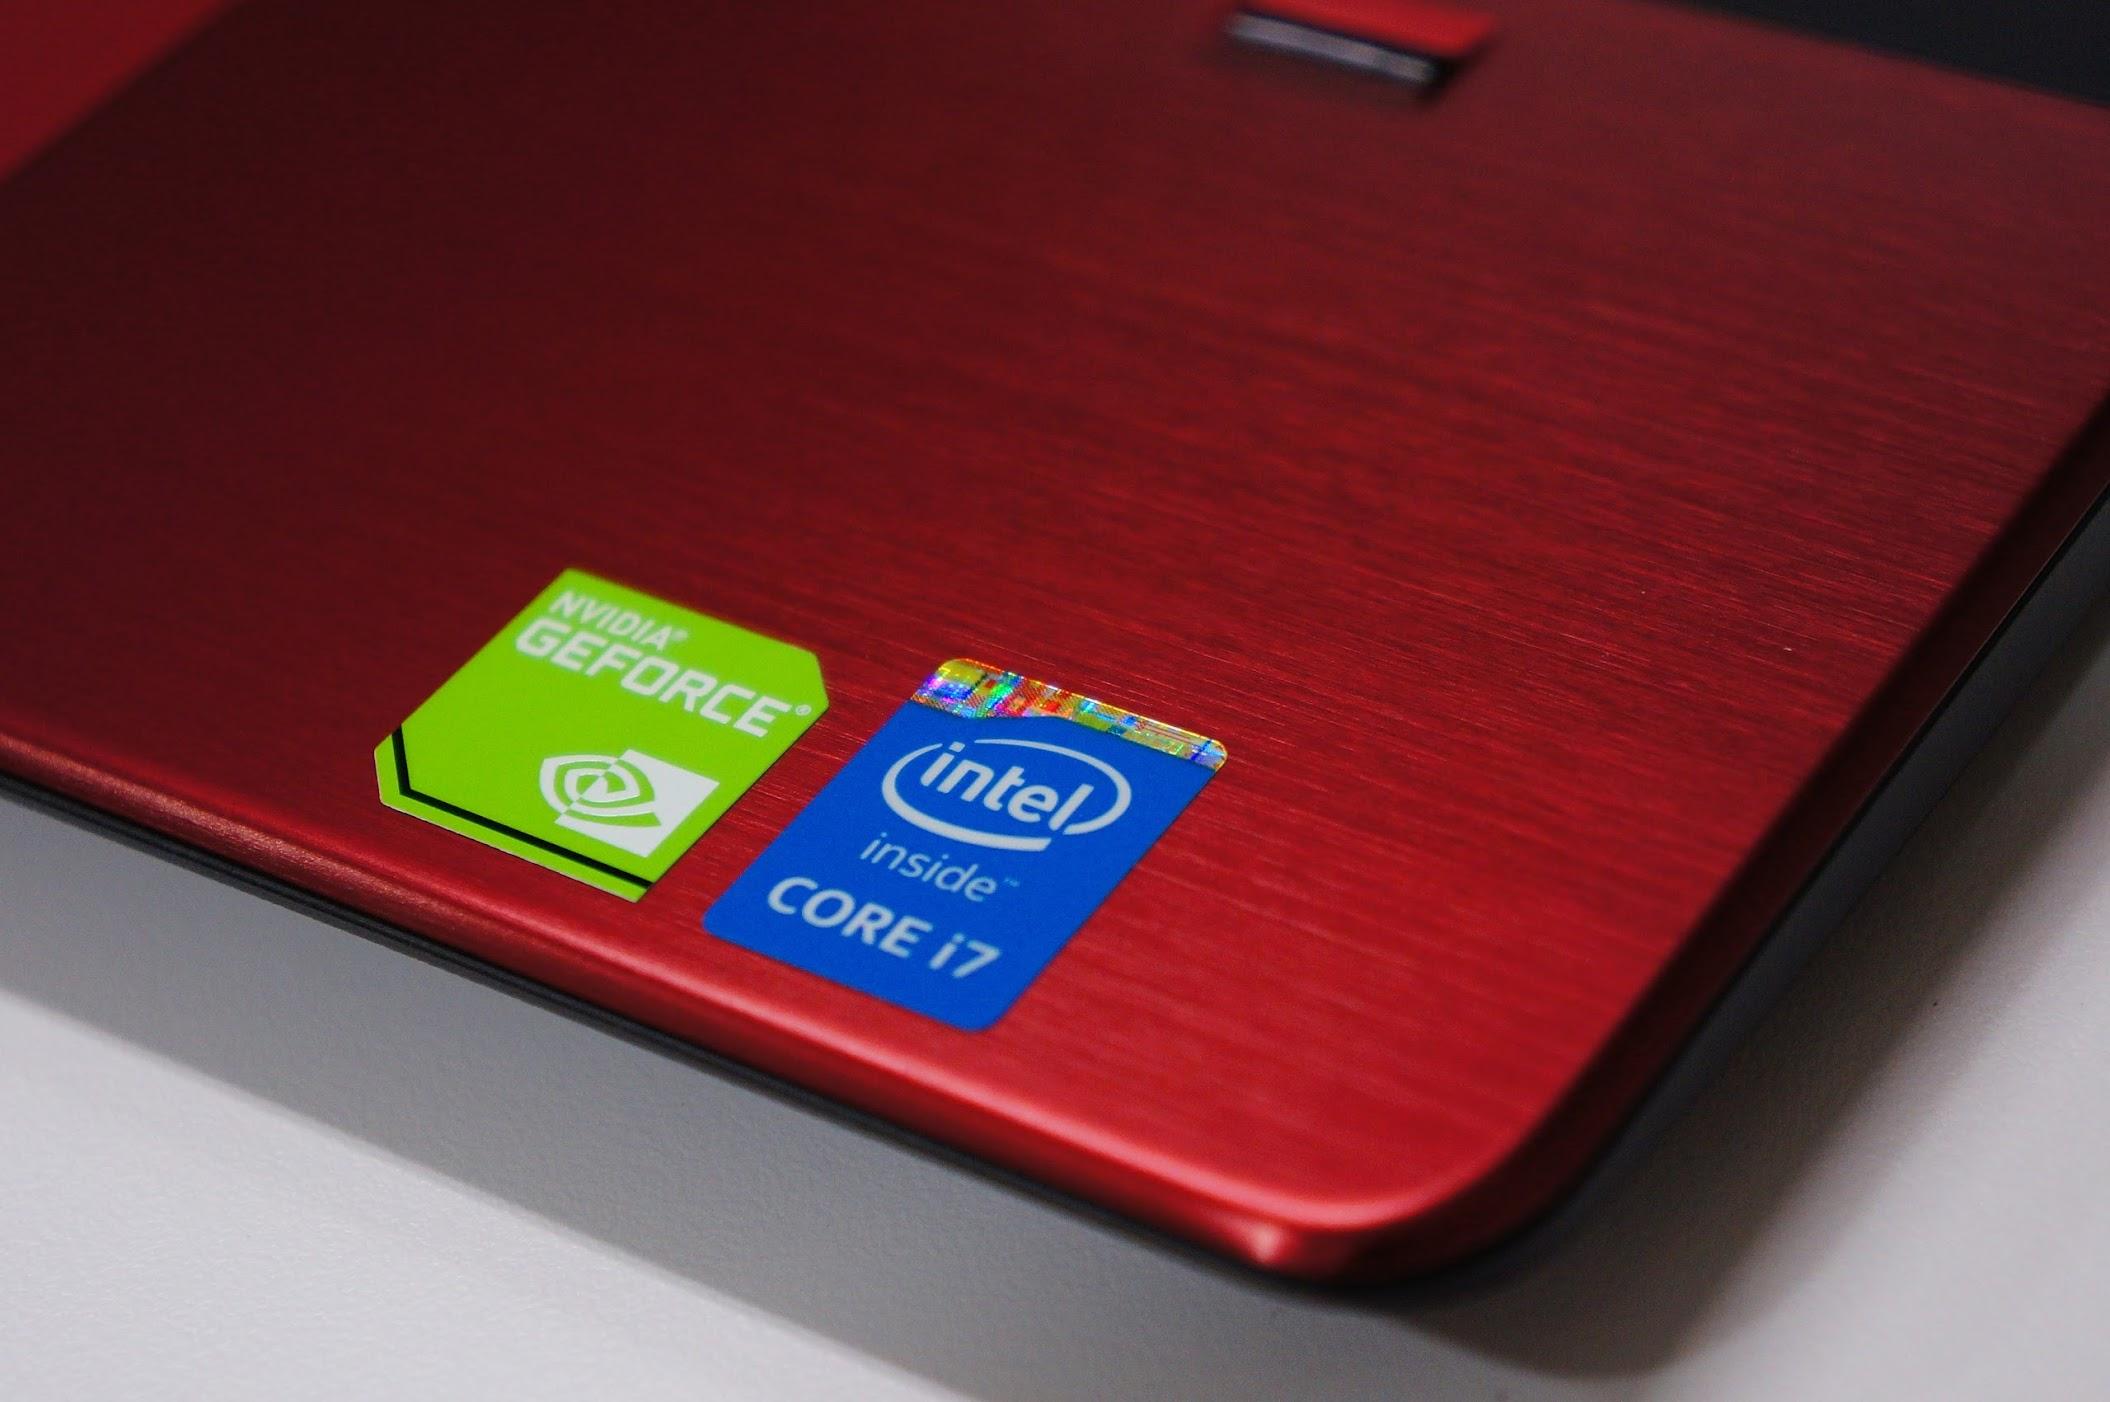 i7 cpu,是說對女生而言,i7和i5差不多..但對我而言,這有差異啊!! 還有年代!! 至於那個Nvidia GT 830M,堪用而已....